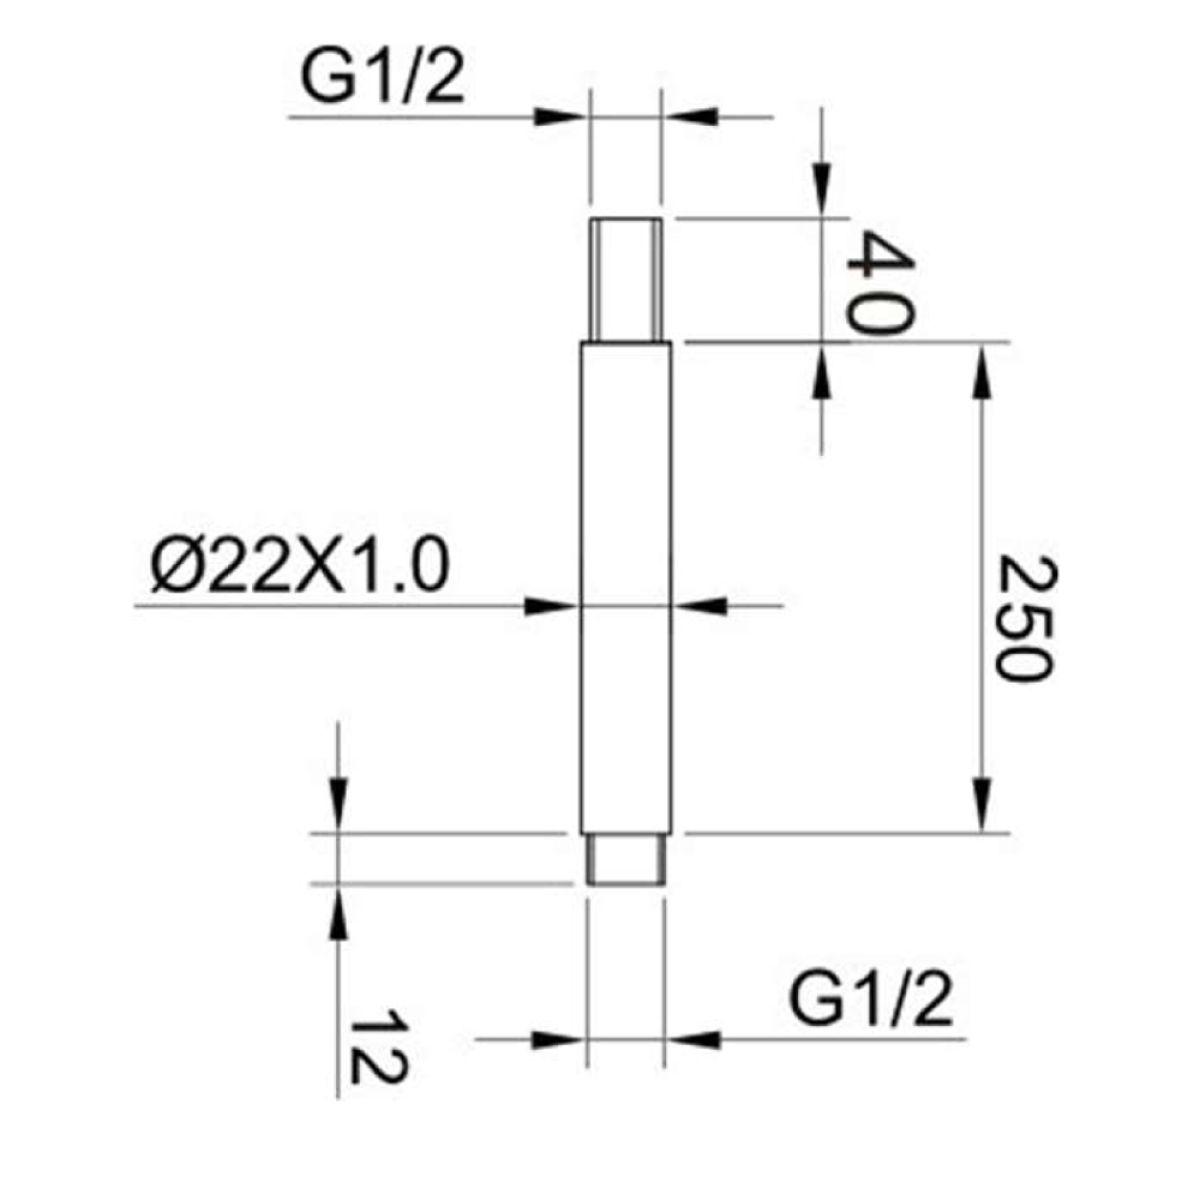 RAK Chrome Round Ceiling Mounted Shower Arm 250mm Measurements